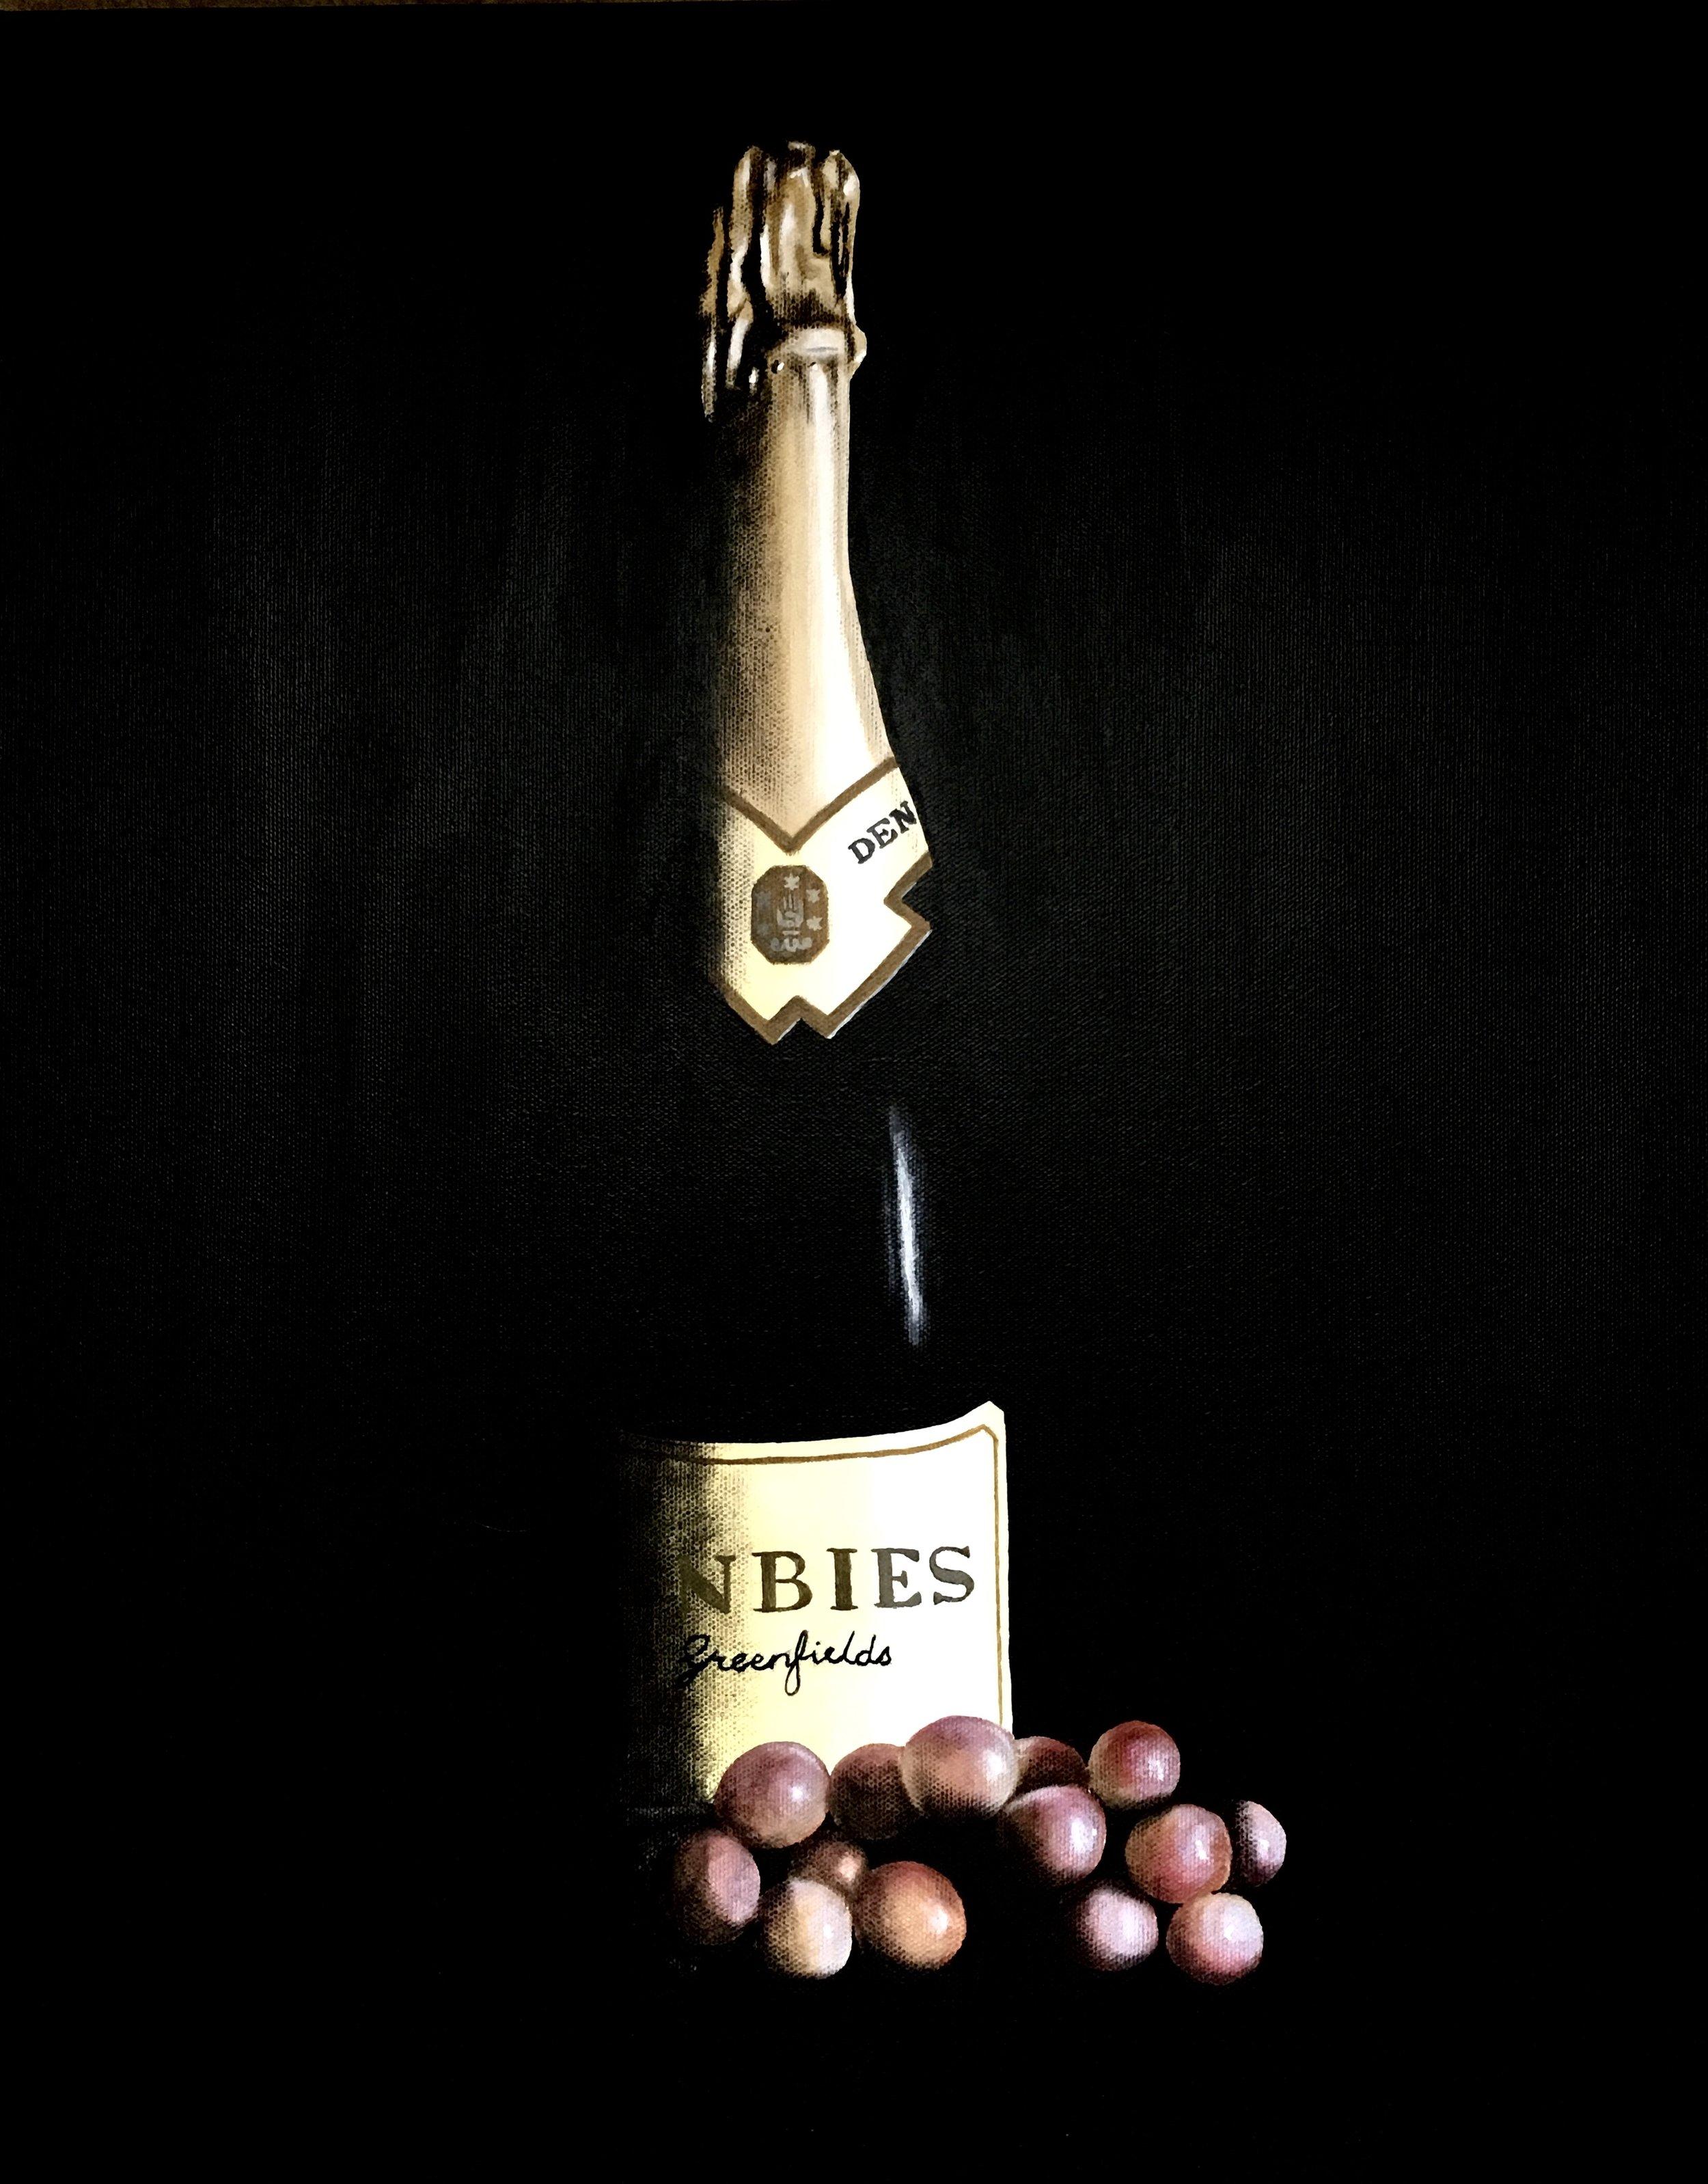 Denbies Wine & Grapes